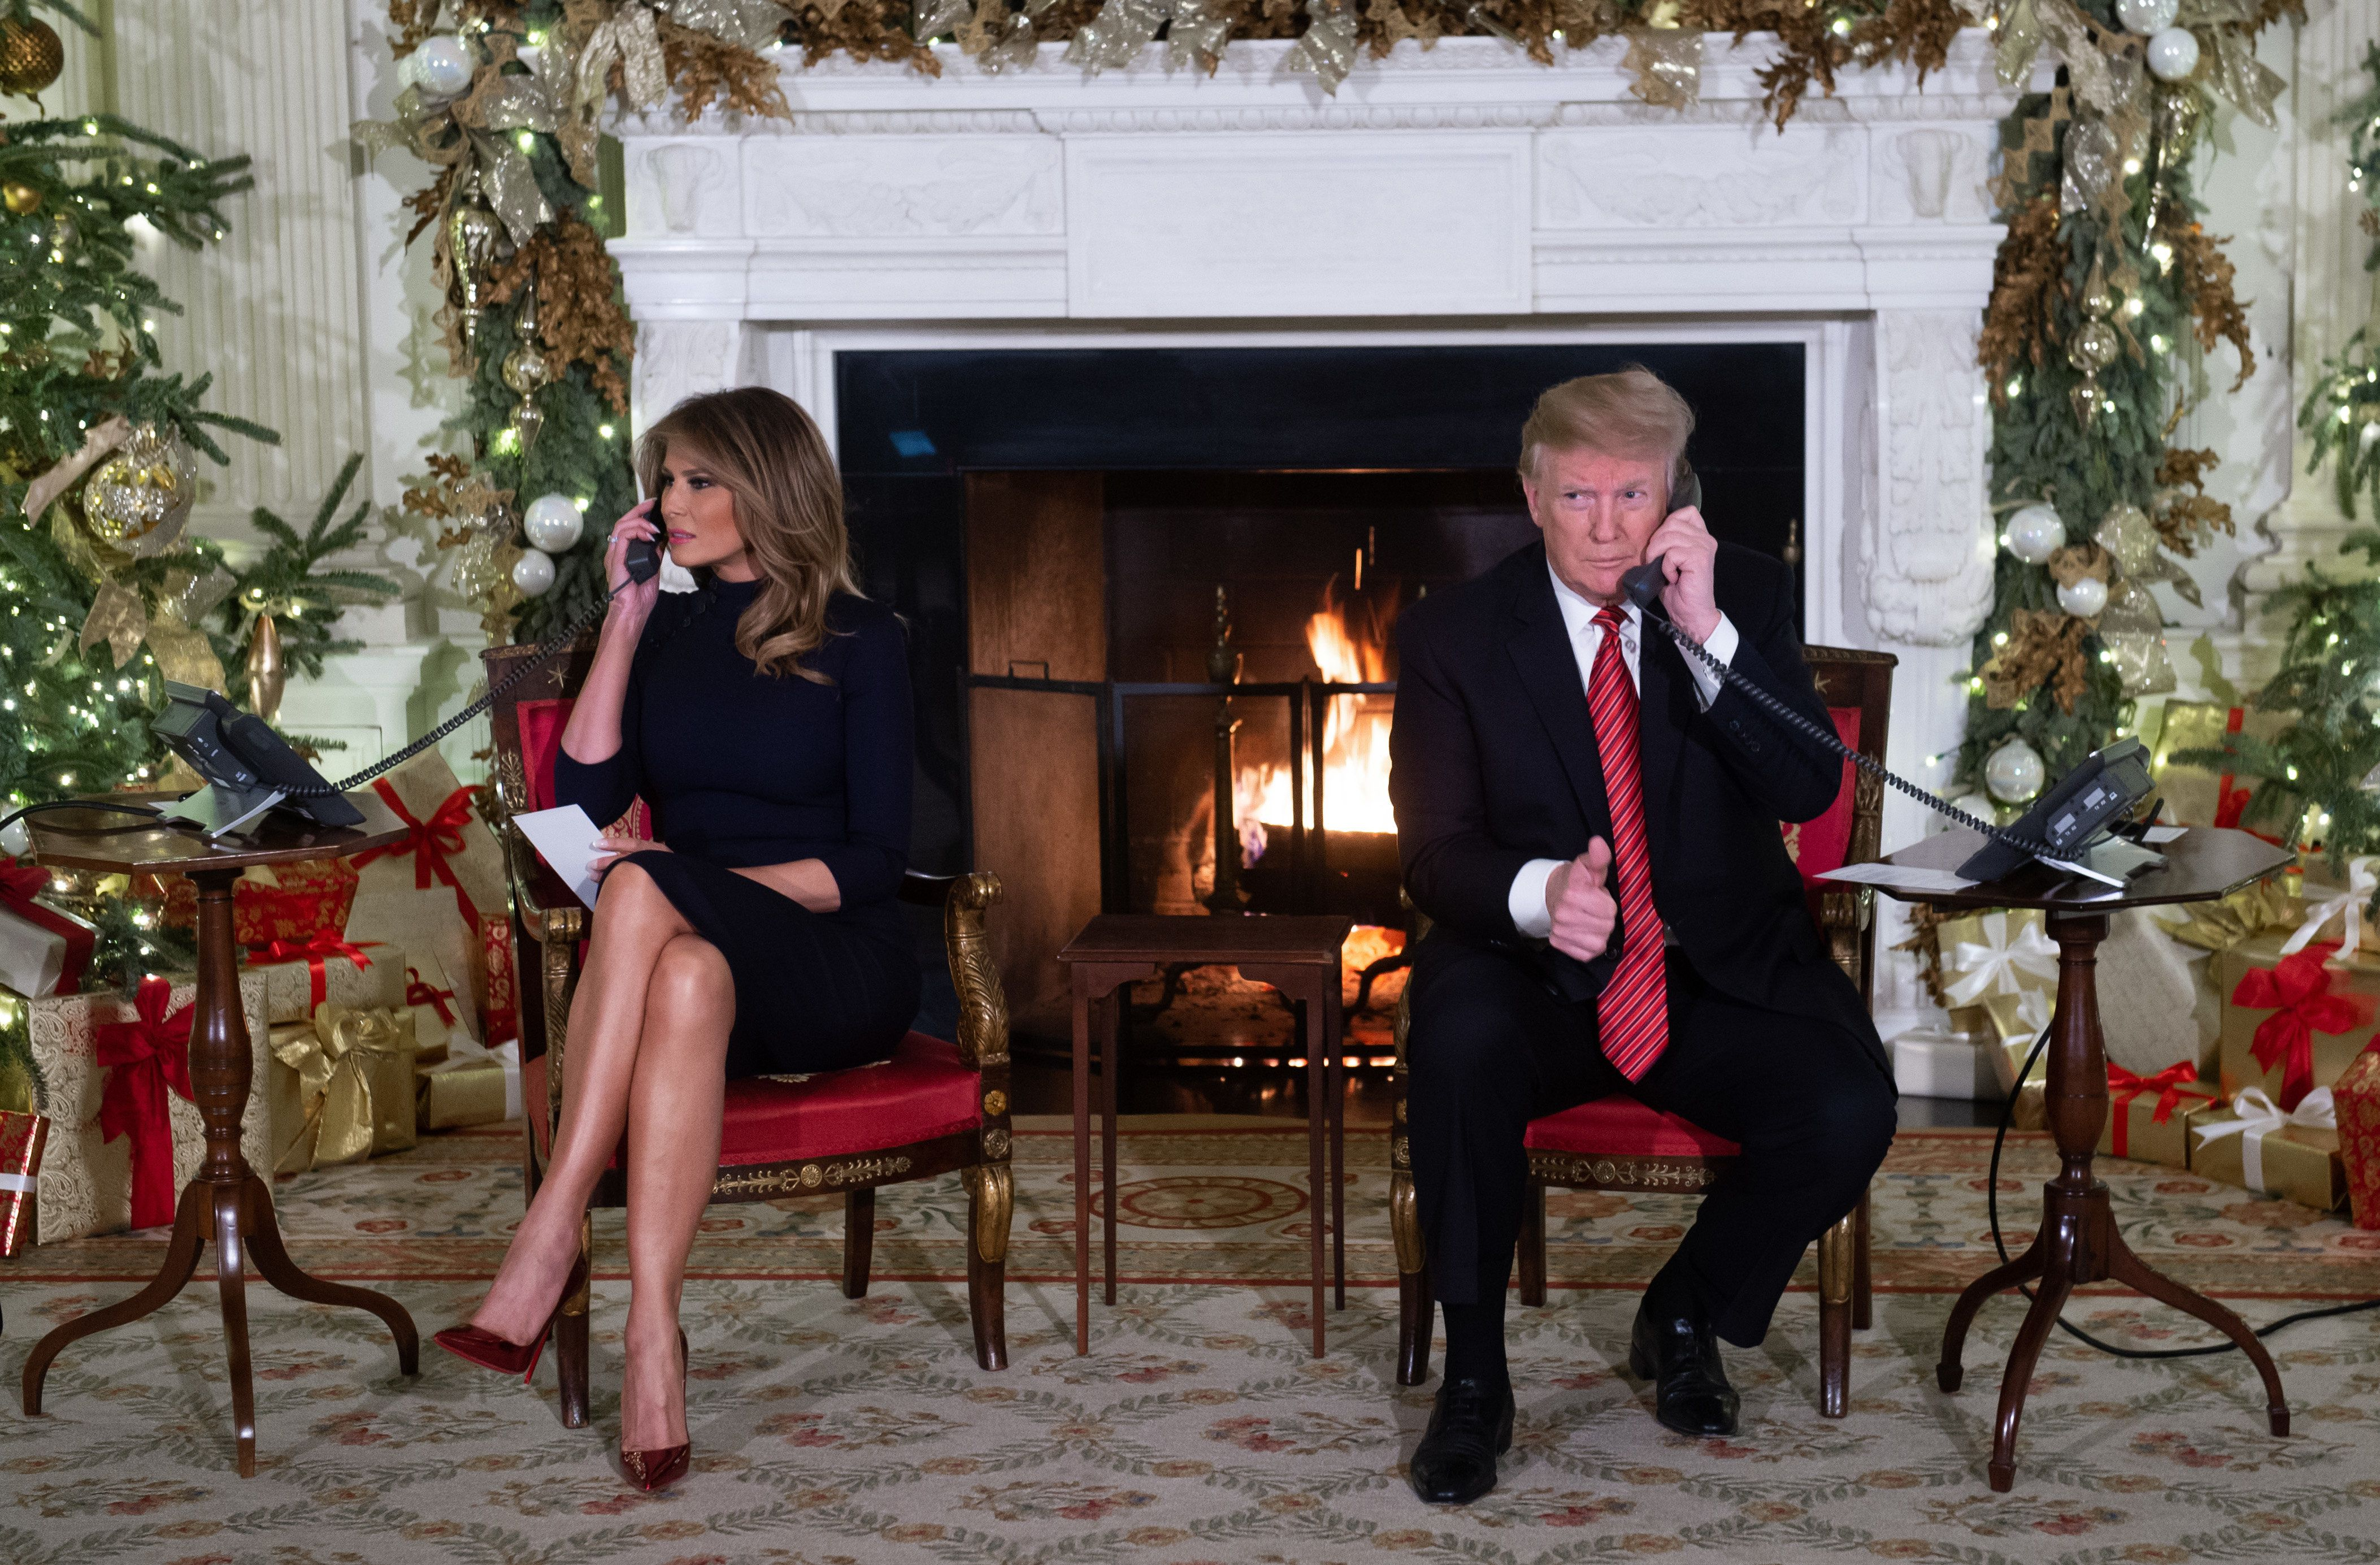 SAUL LOEB via Getty Images               Melania und Donald Trump nehmen Anrufe von Kindern entgegen